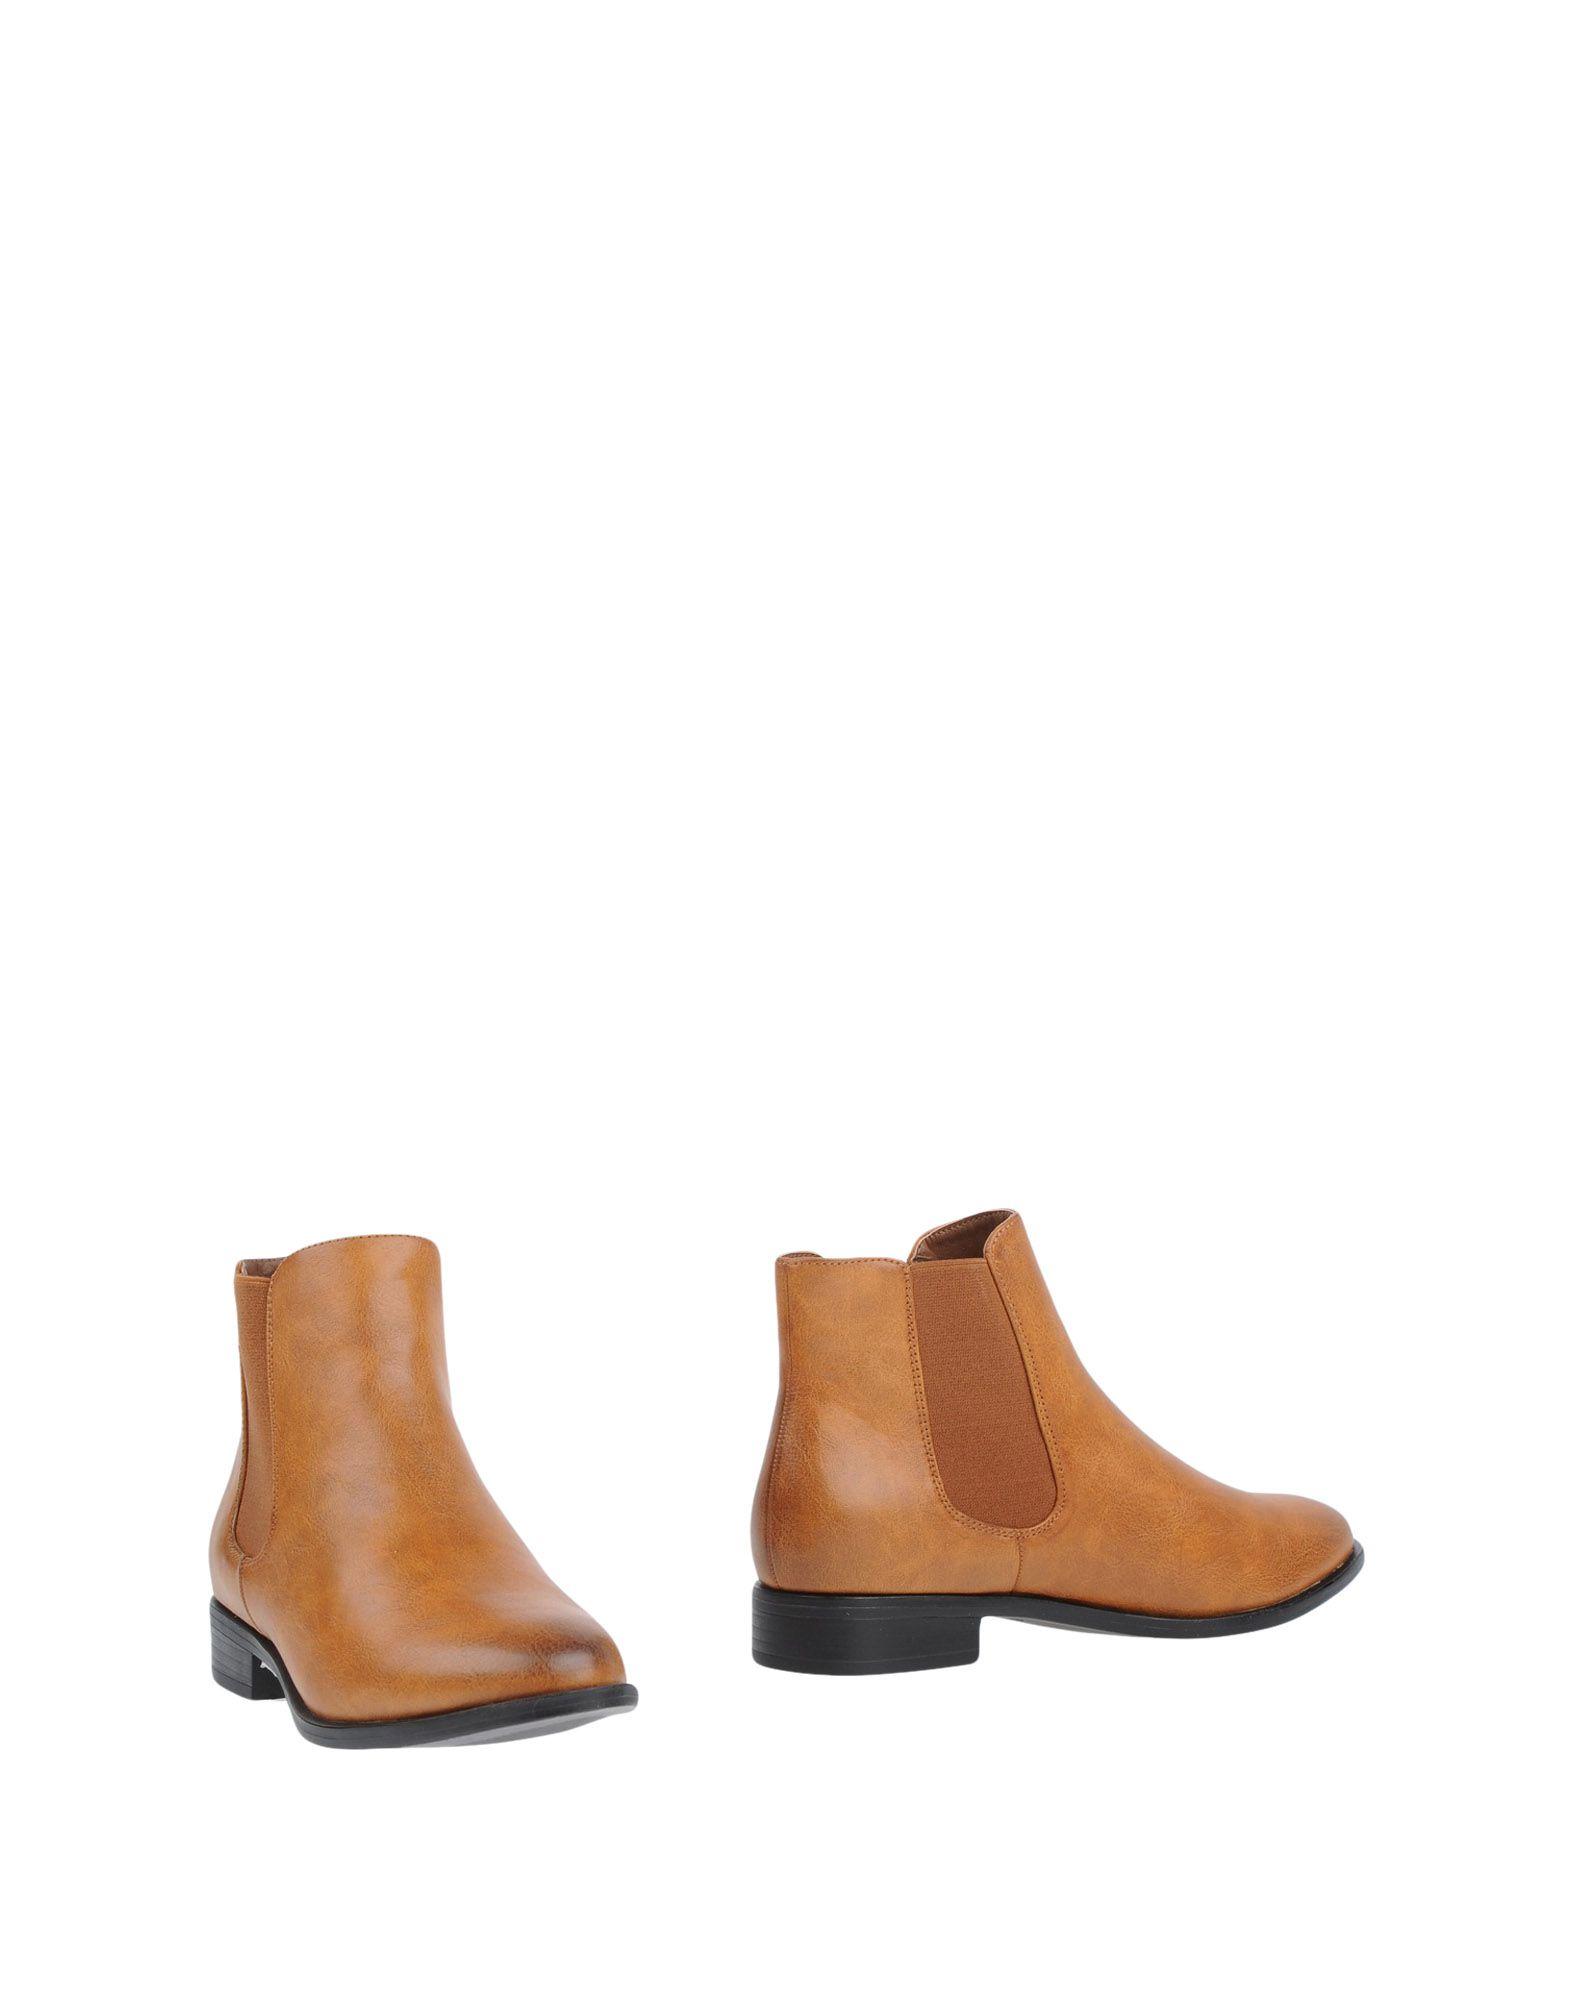 ONLY Полусапоги и высокие ботинки george j love полусапоги и высокие ботинки